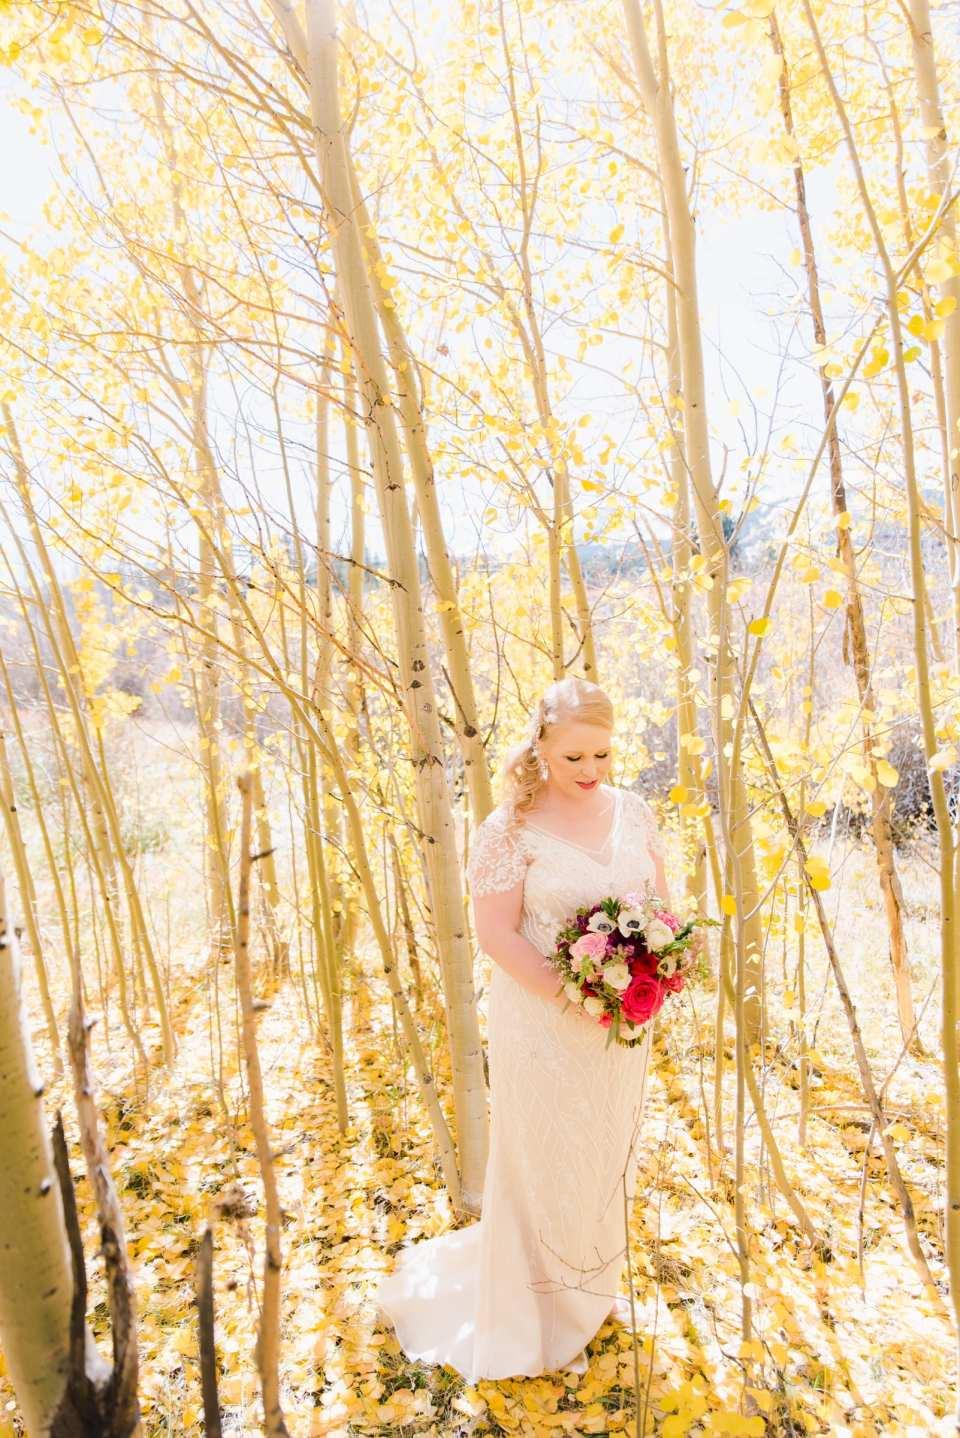 Bride in Aspen Trees in Fall Colorado Wedding | Josie V Photography